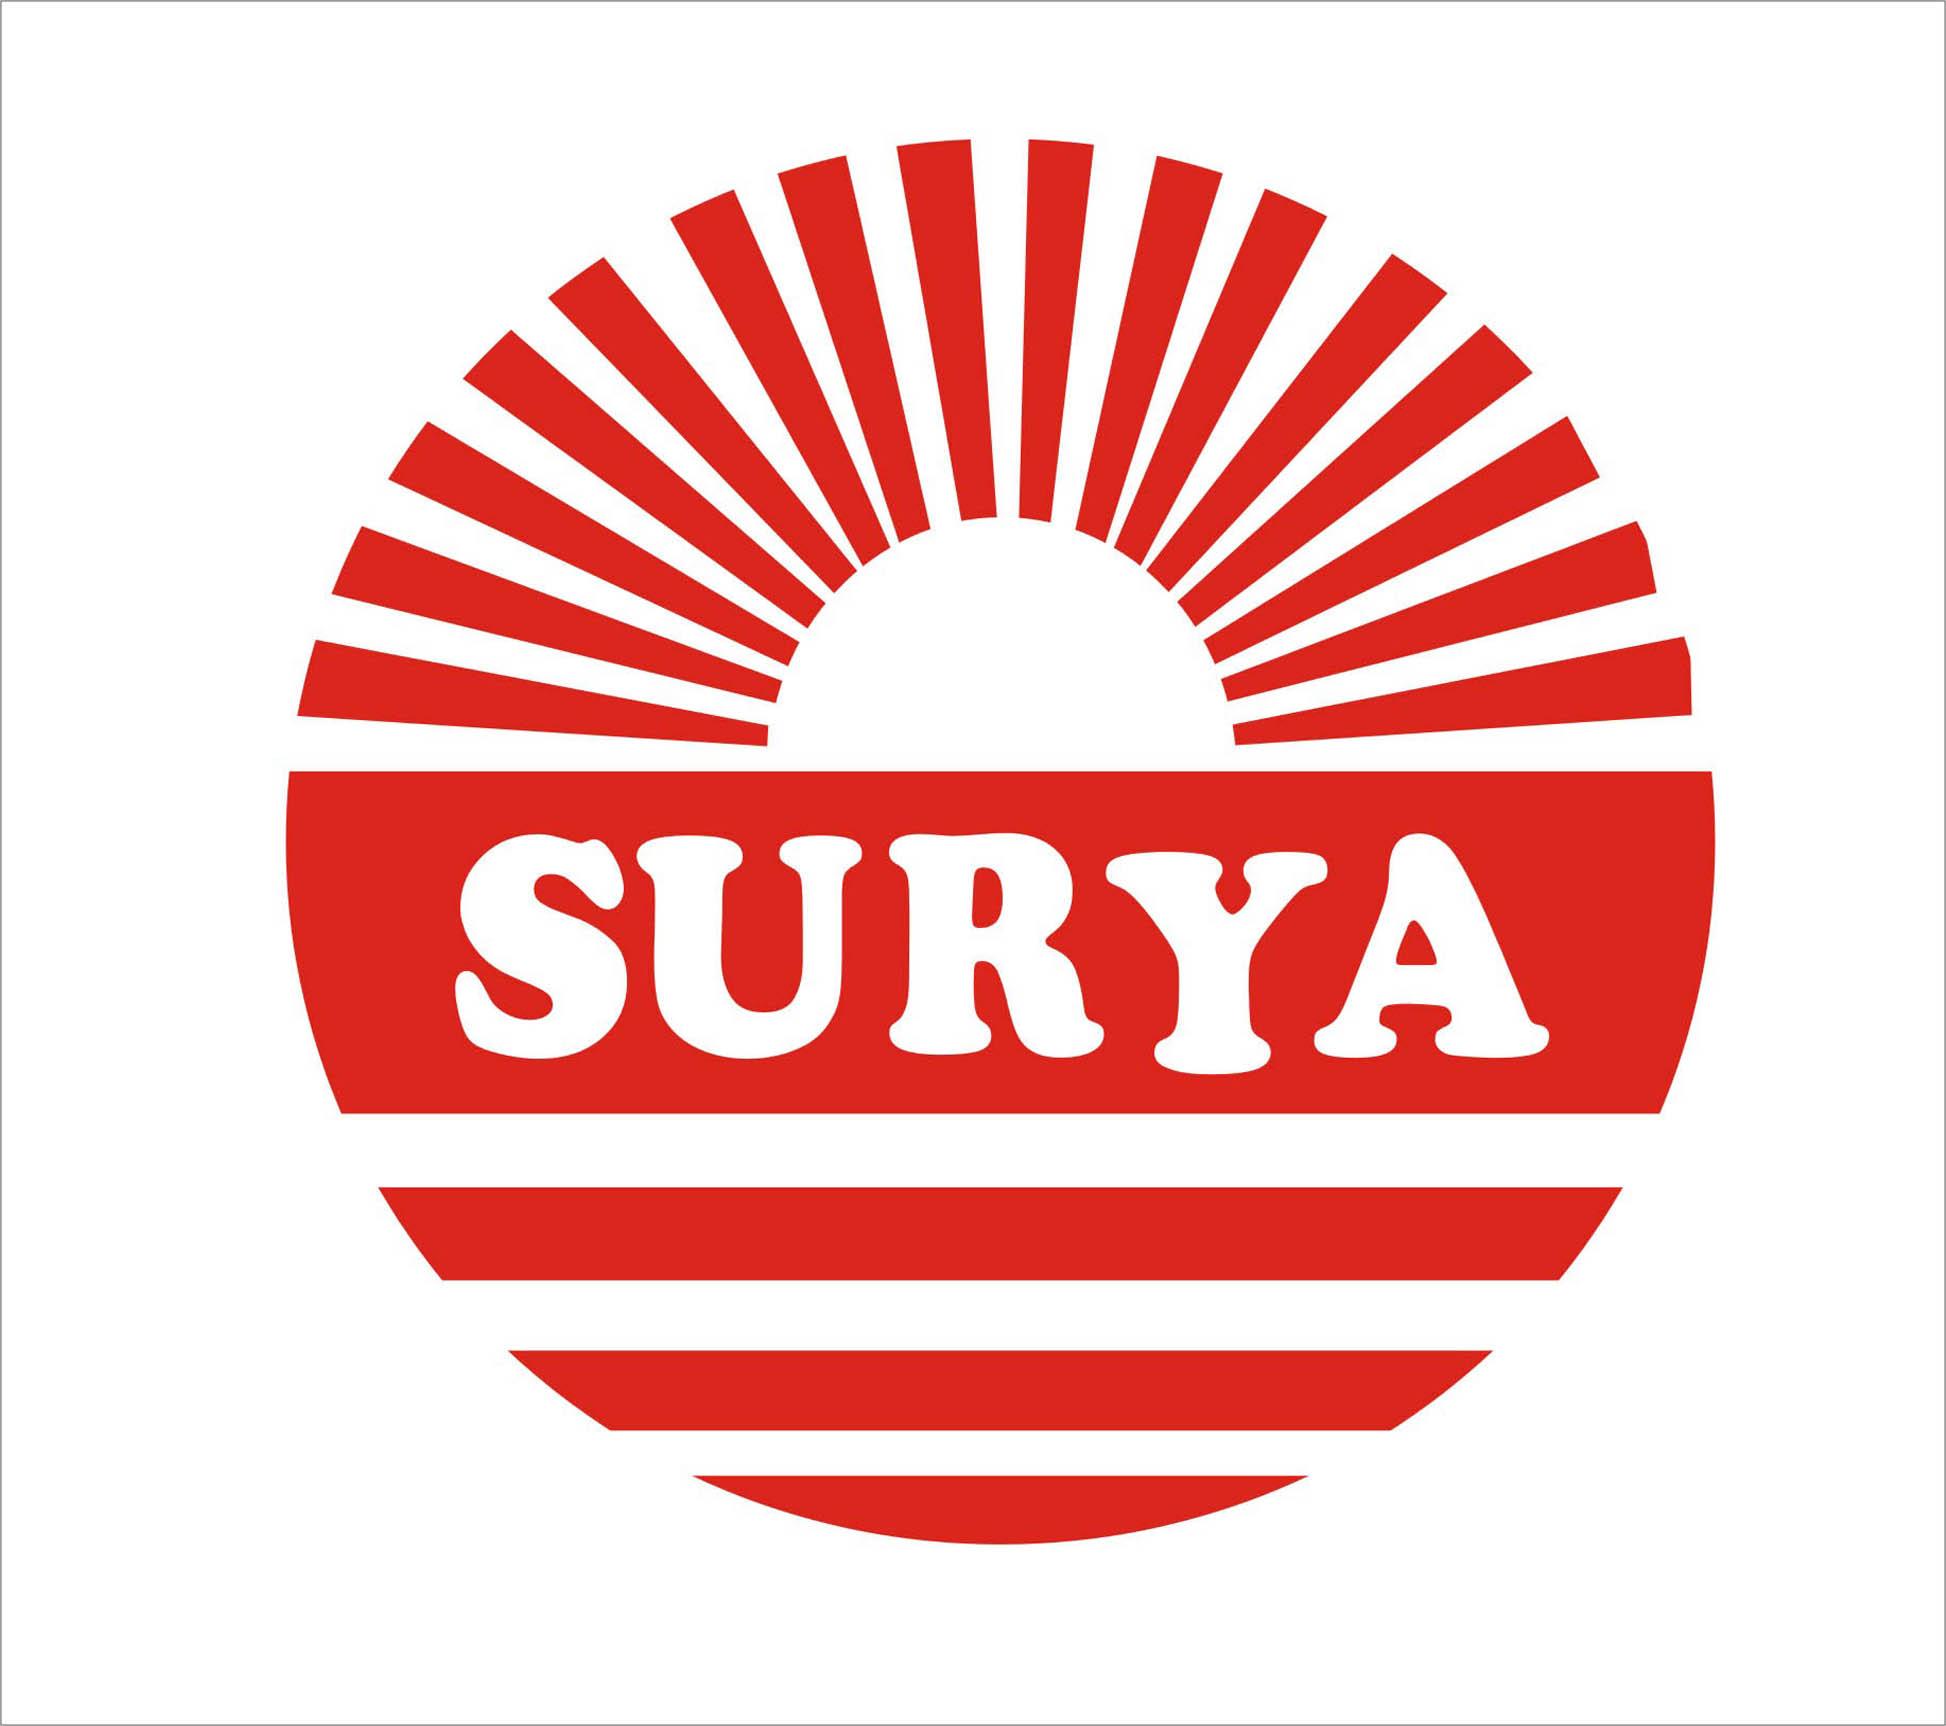 surya-roshni-ltd